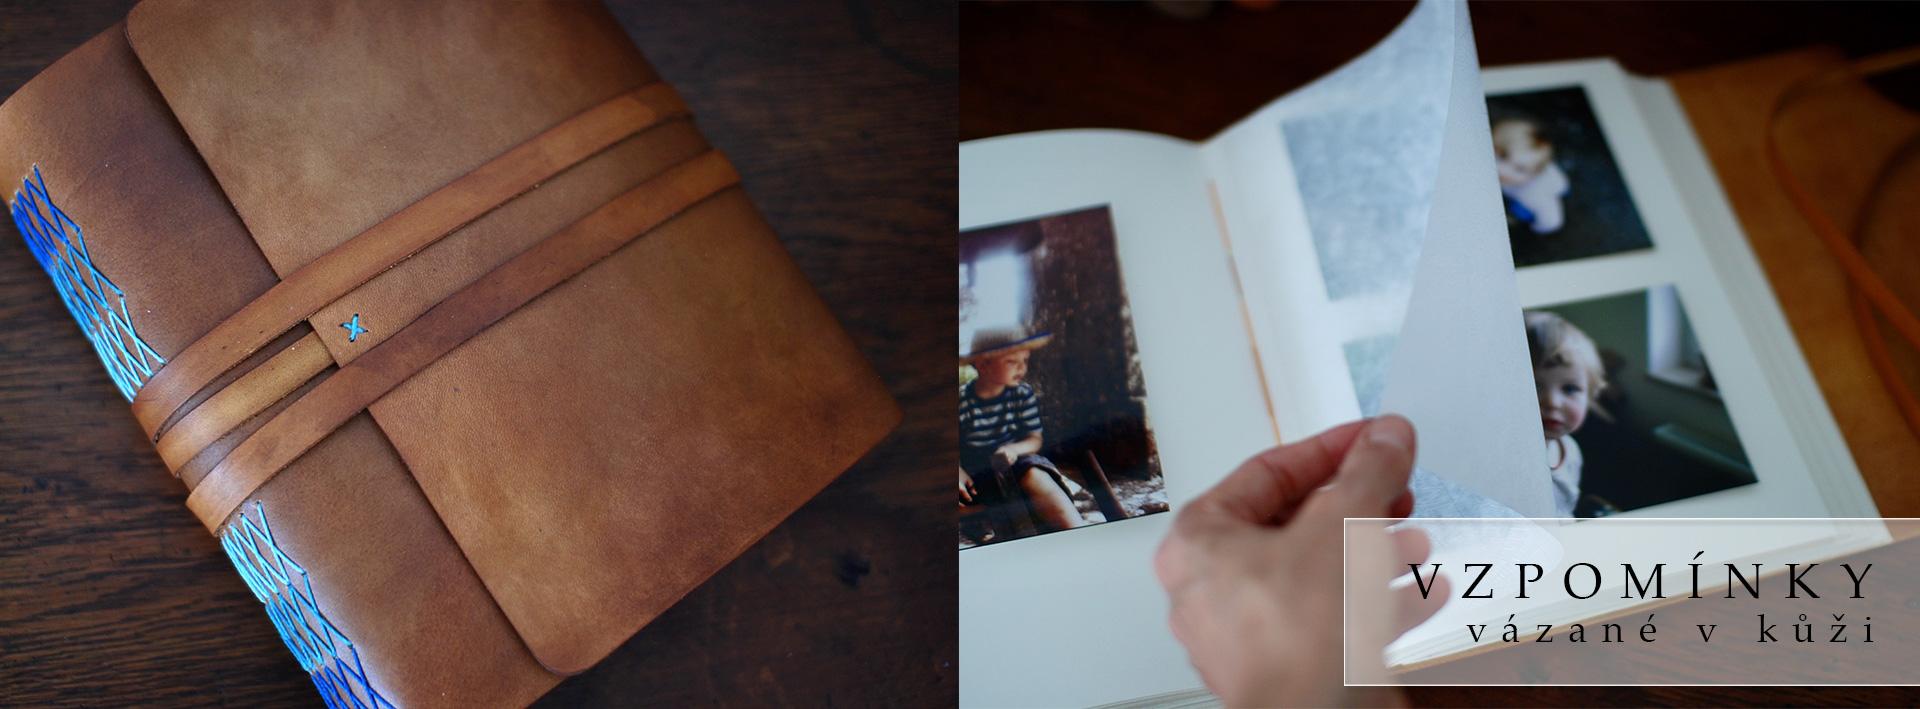 Kožené fotoalbum